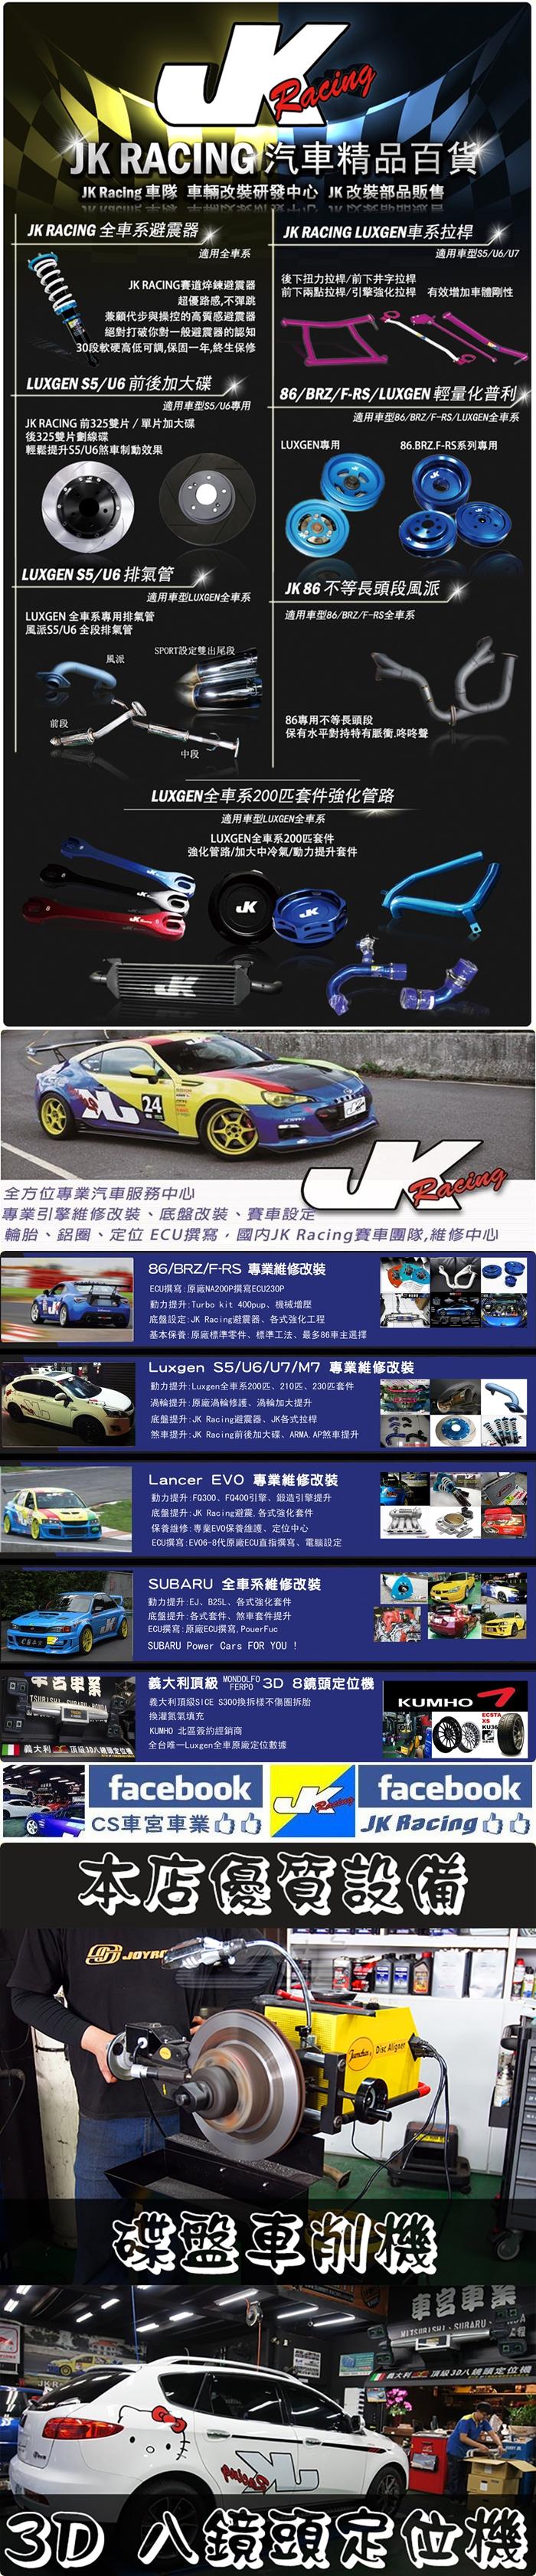 CS車宮車業 ZERO / SPORTS 酯類合成機油 匠系列 0W20 4L 日本製